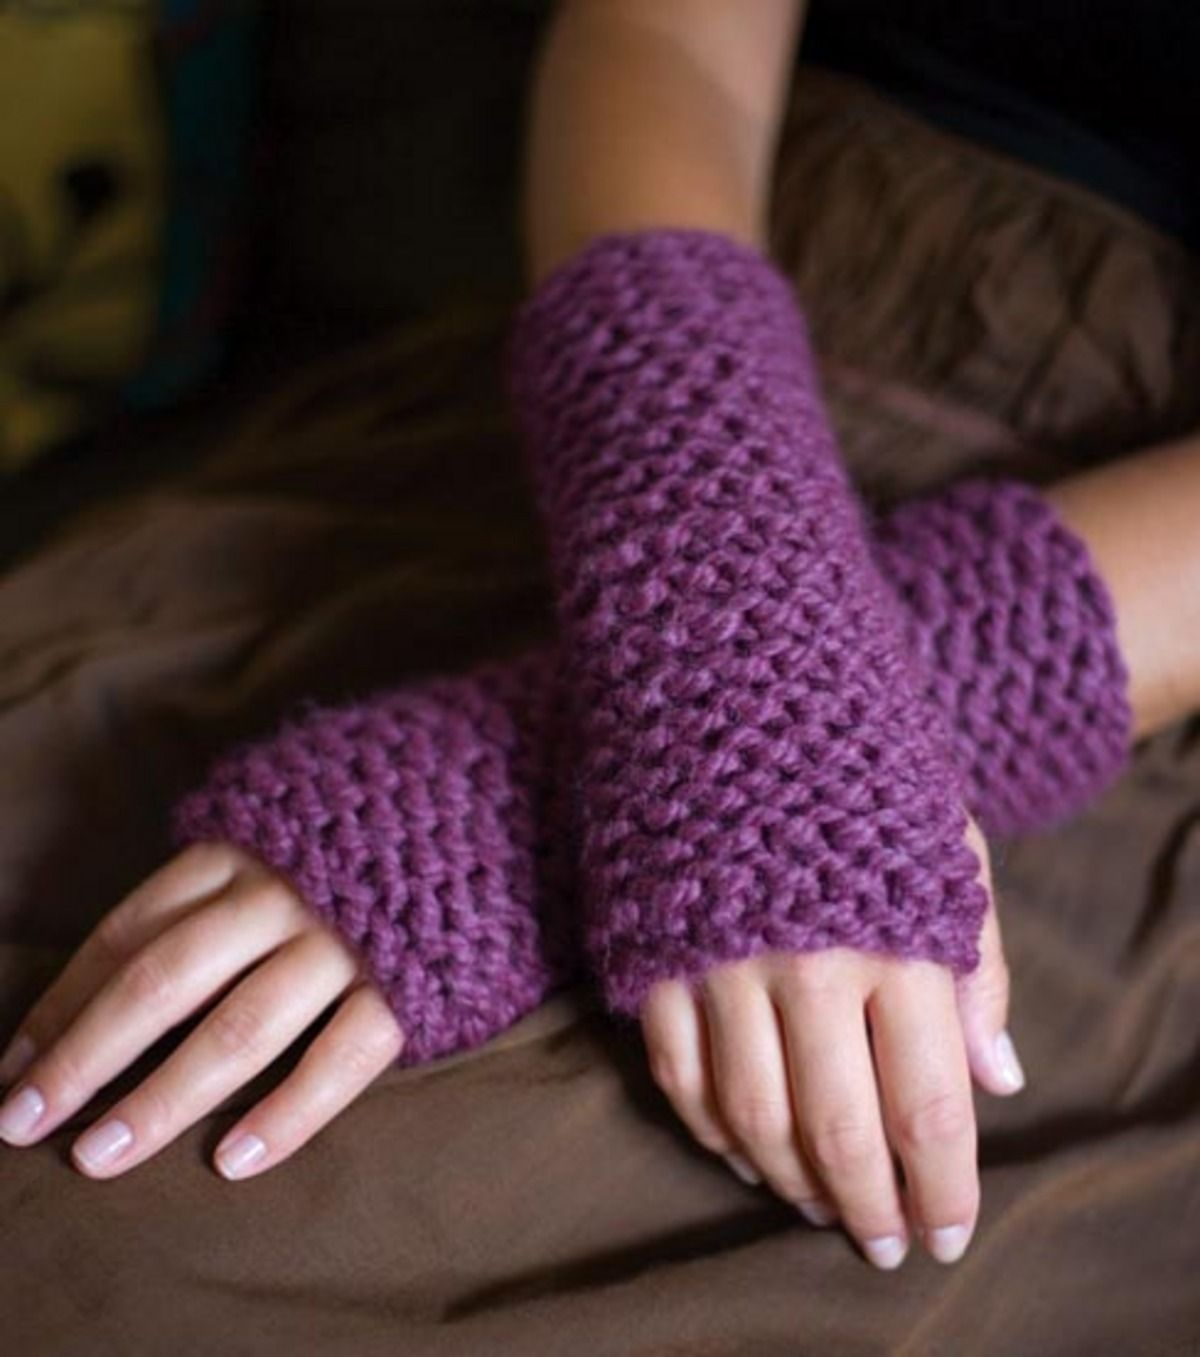 Knitted wrist cuffs free knitting pattern knit and crochet knitted wrist cuffs free knitting pattern bankloansurffo Image collections